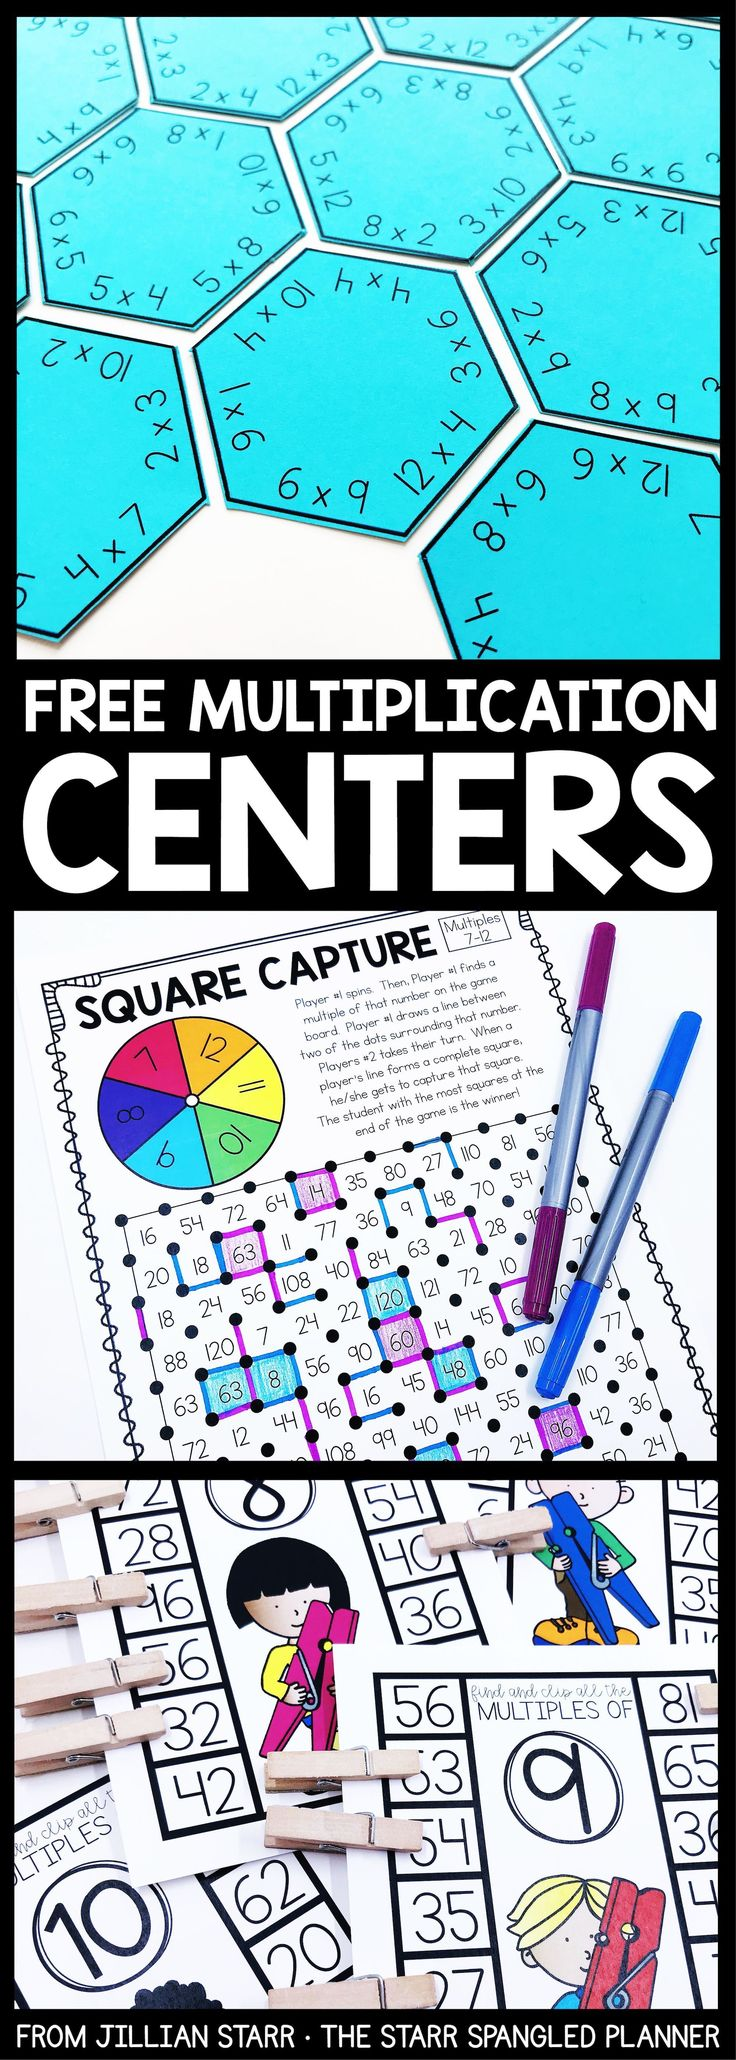 480 best fun math images on Pinterest | Teaching math, School and ...